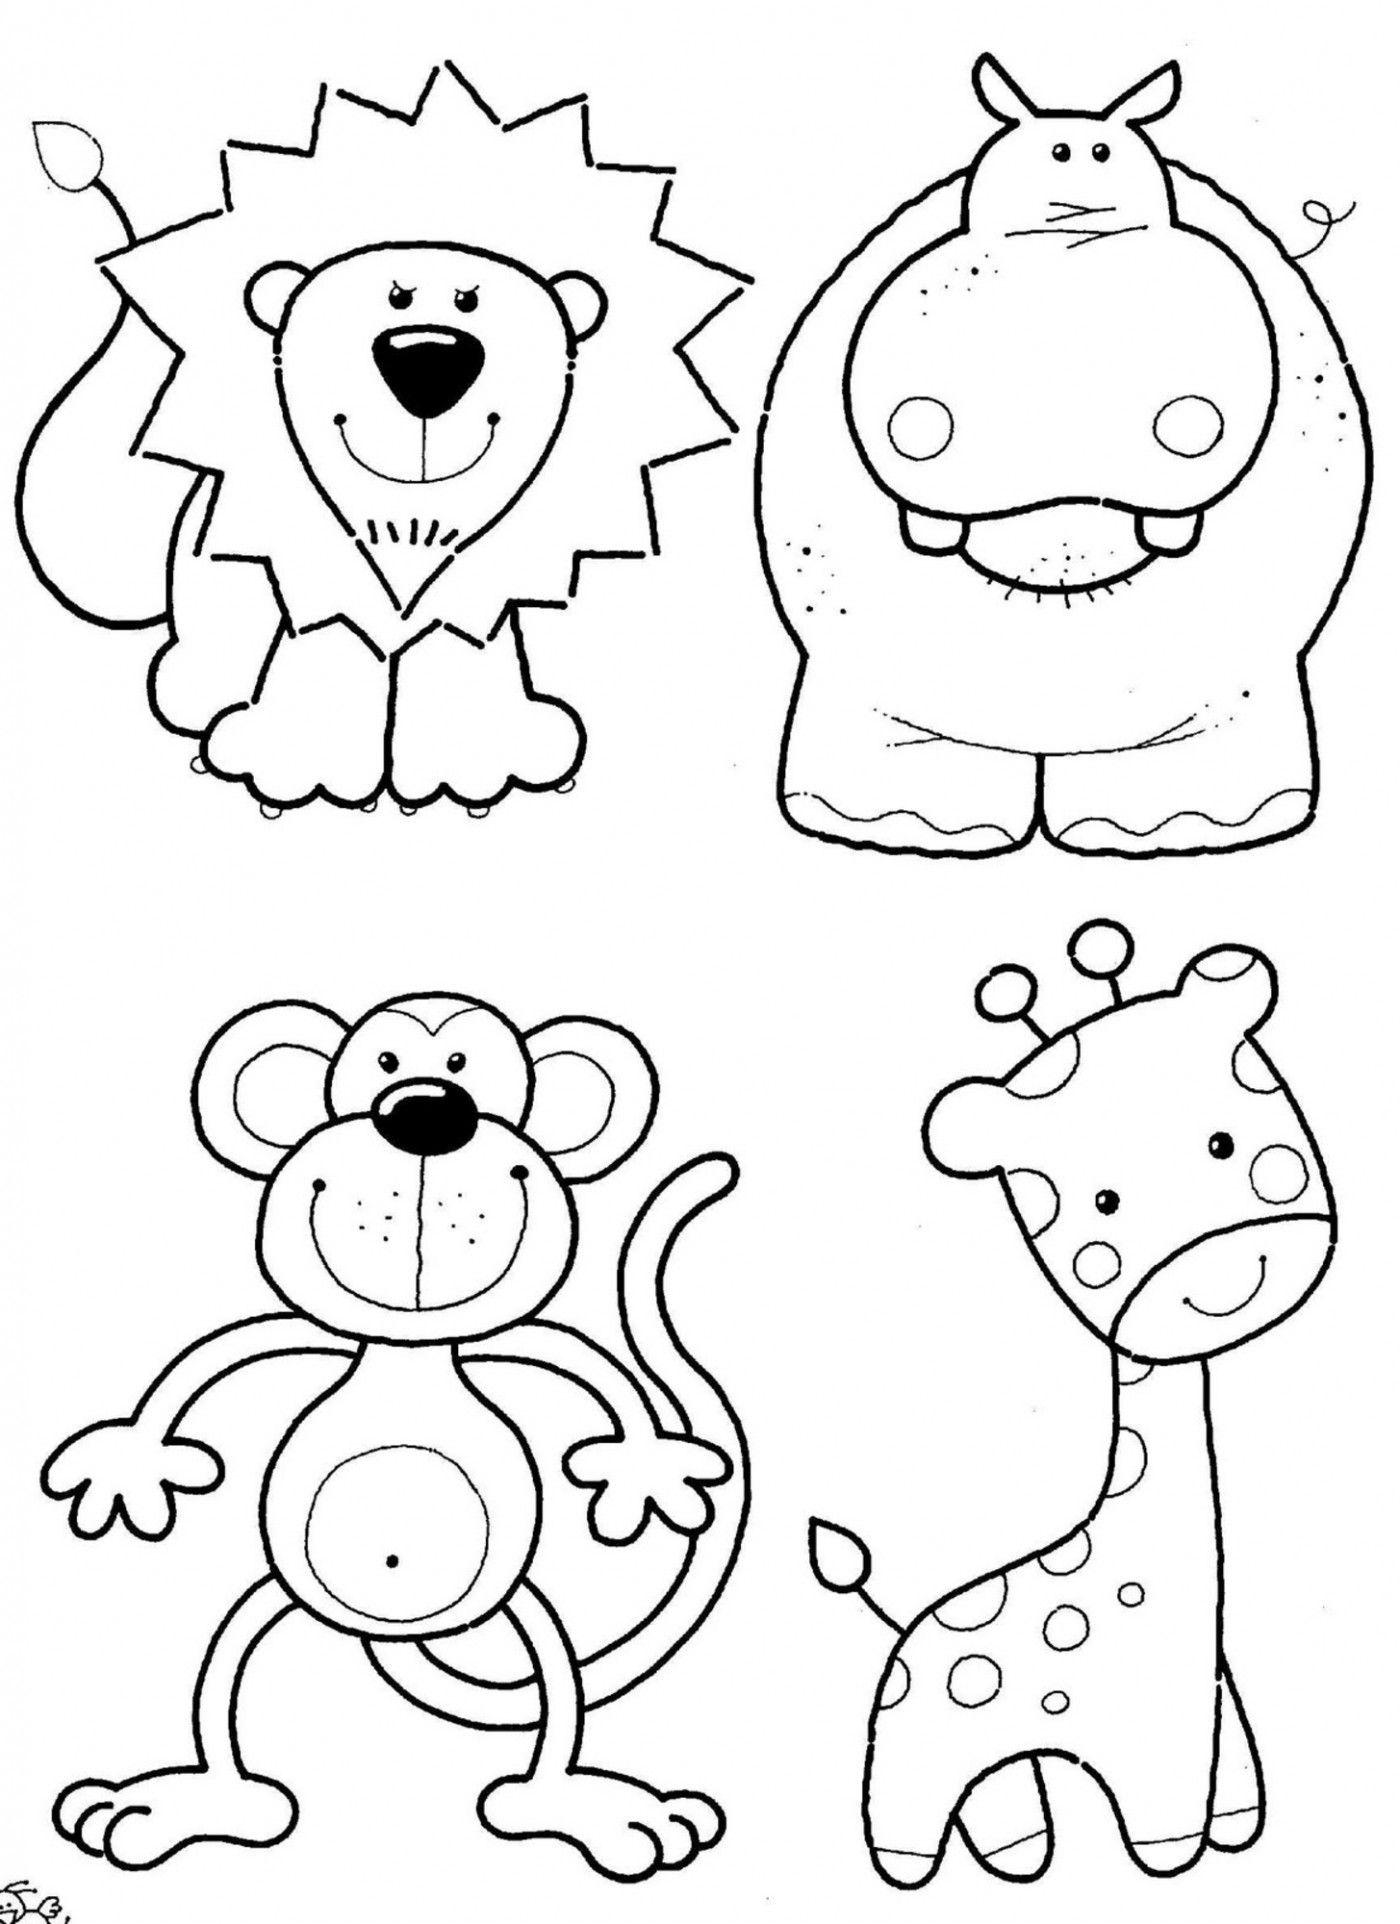 Animal Coloring Pages 14 Zoo Animal Coloring Pages Animal